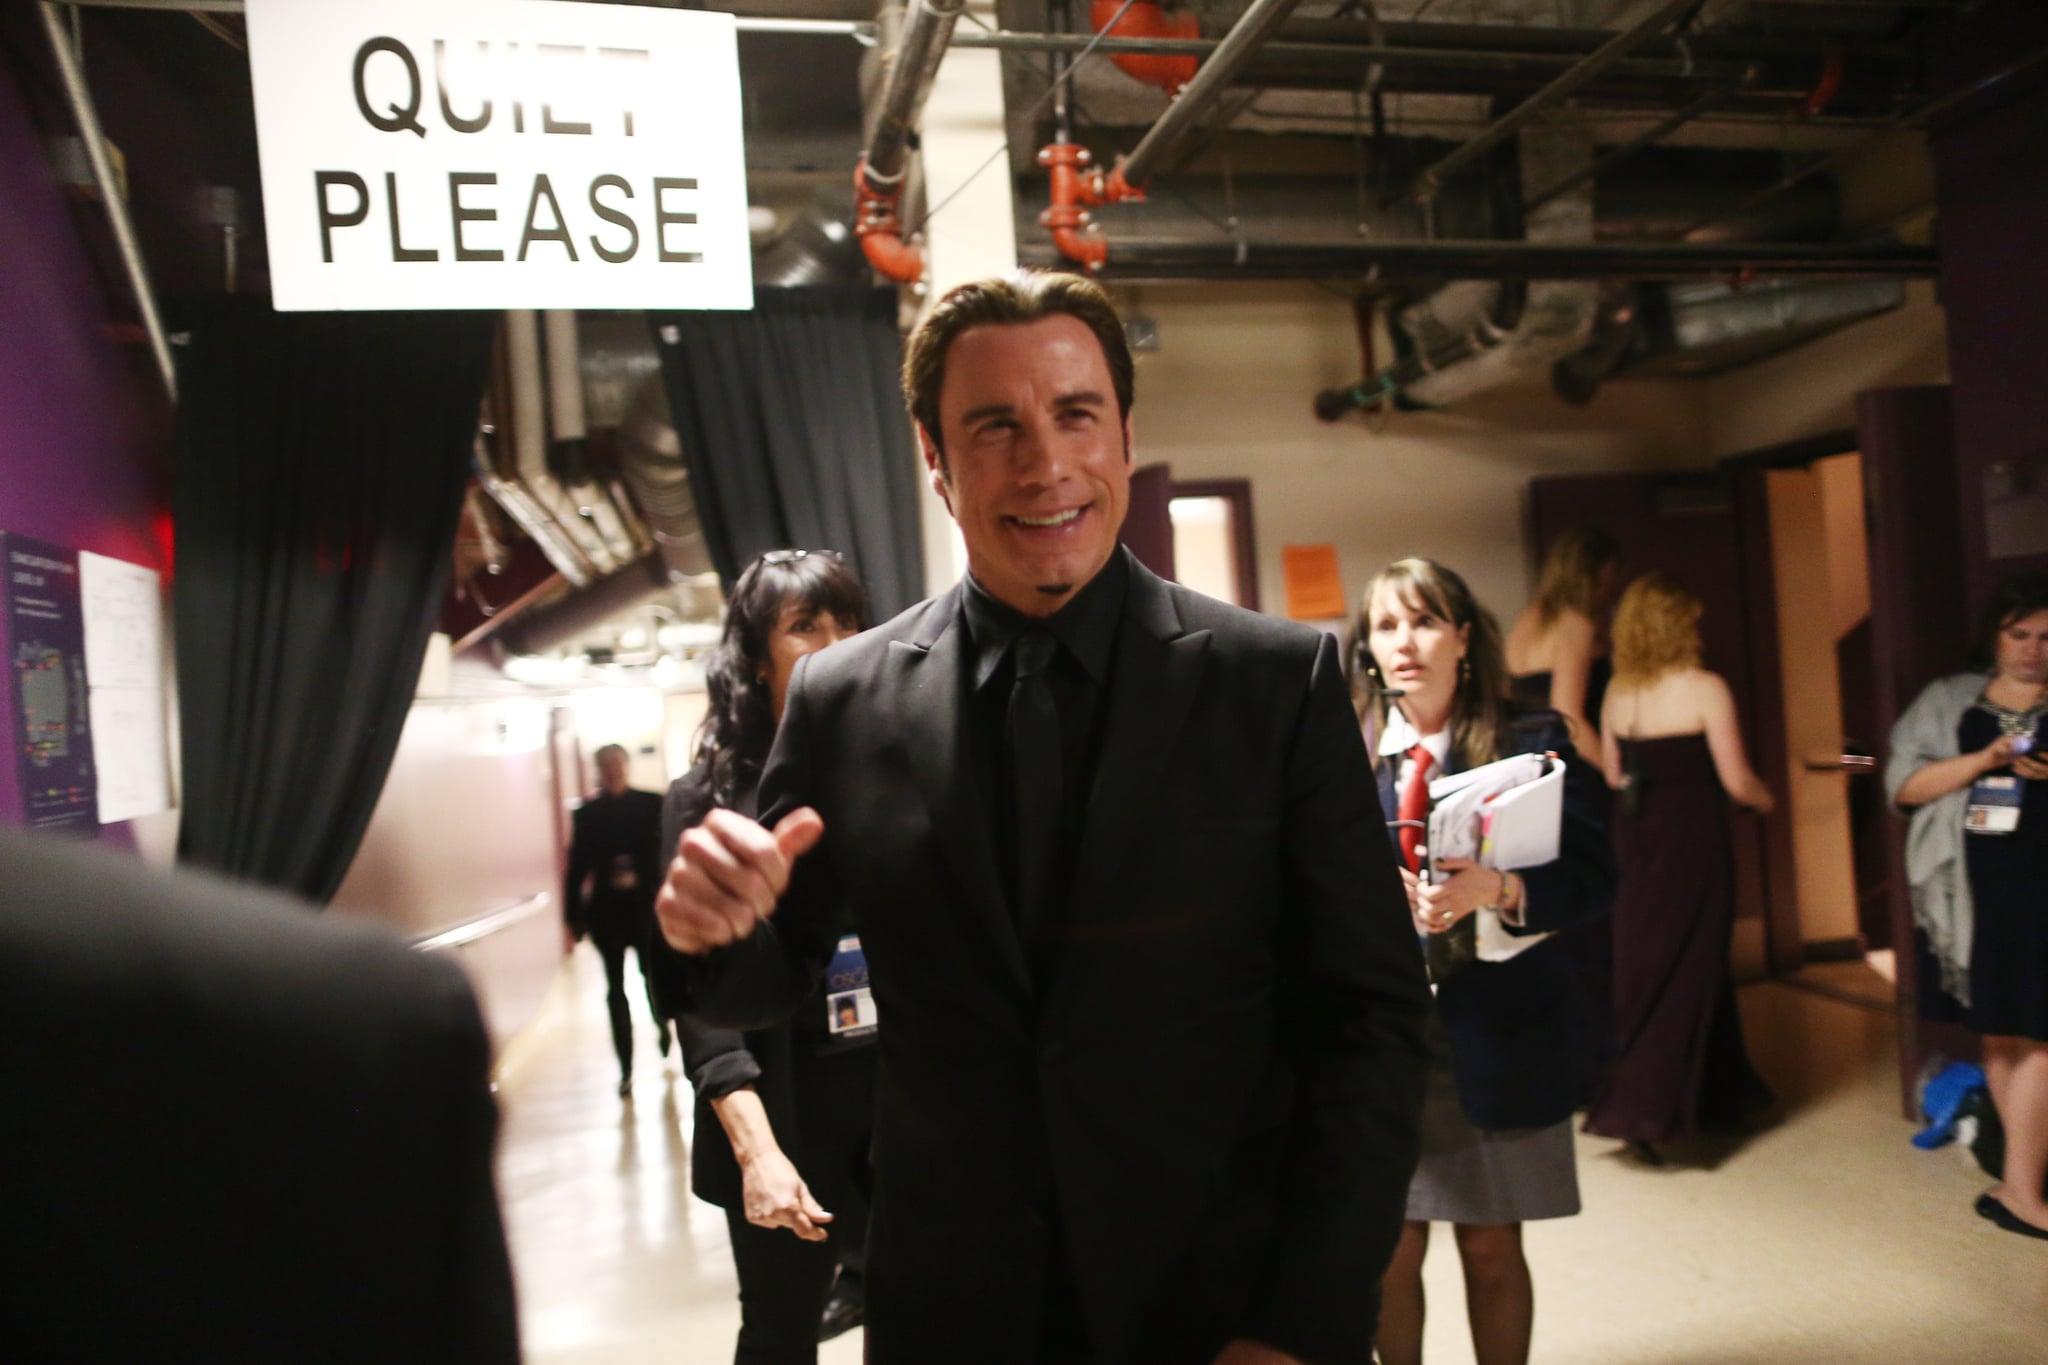 John Travolta backstage at the 2013 Oscars.